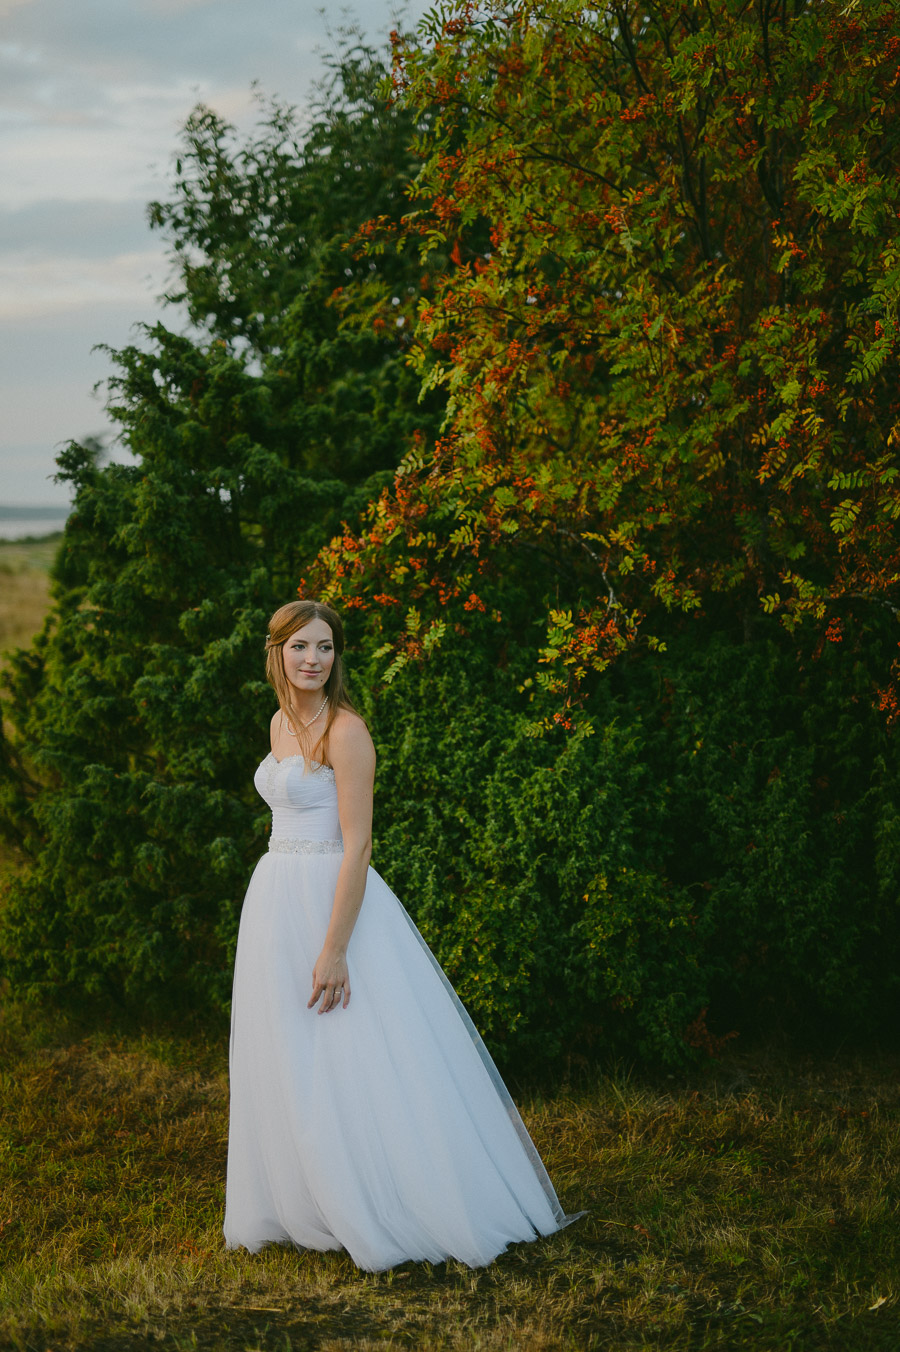 Best_wedding_photos_moments_2014_mait_juriado_M&J-Studios-098